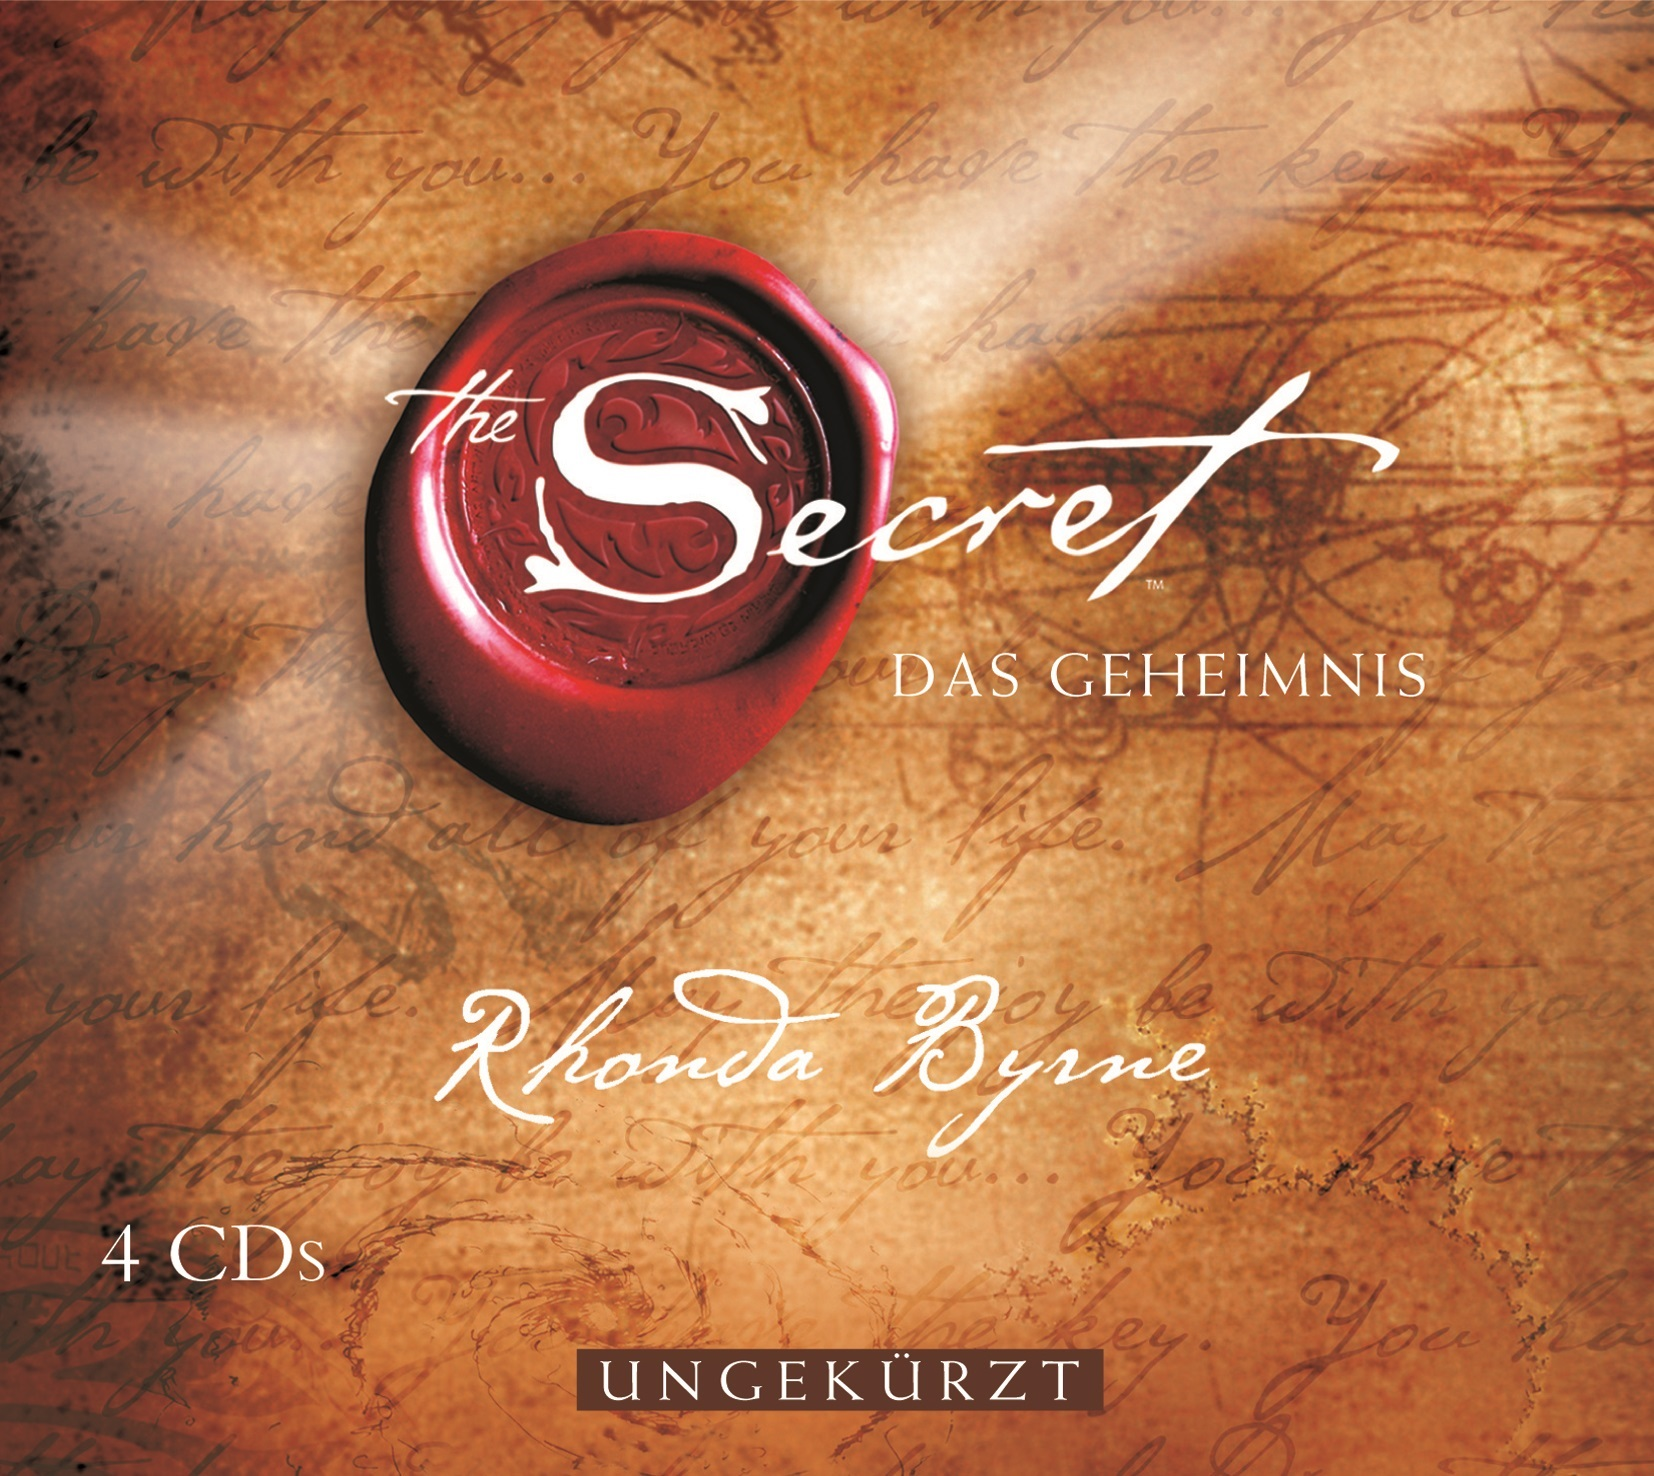 The Secret - Das Geheimnis - Rhonda Byrne [4 Audio CDs]